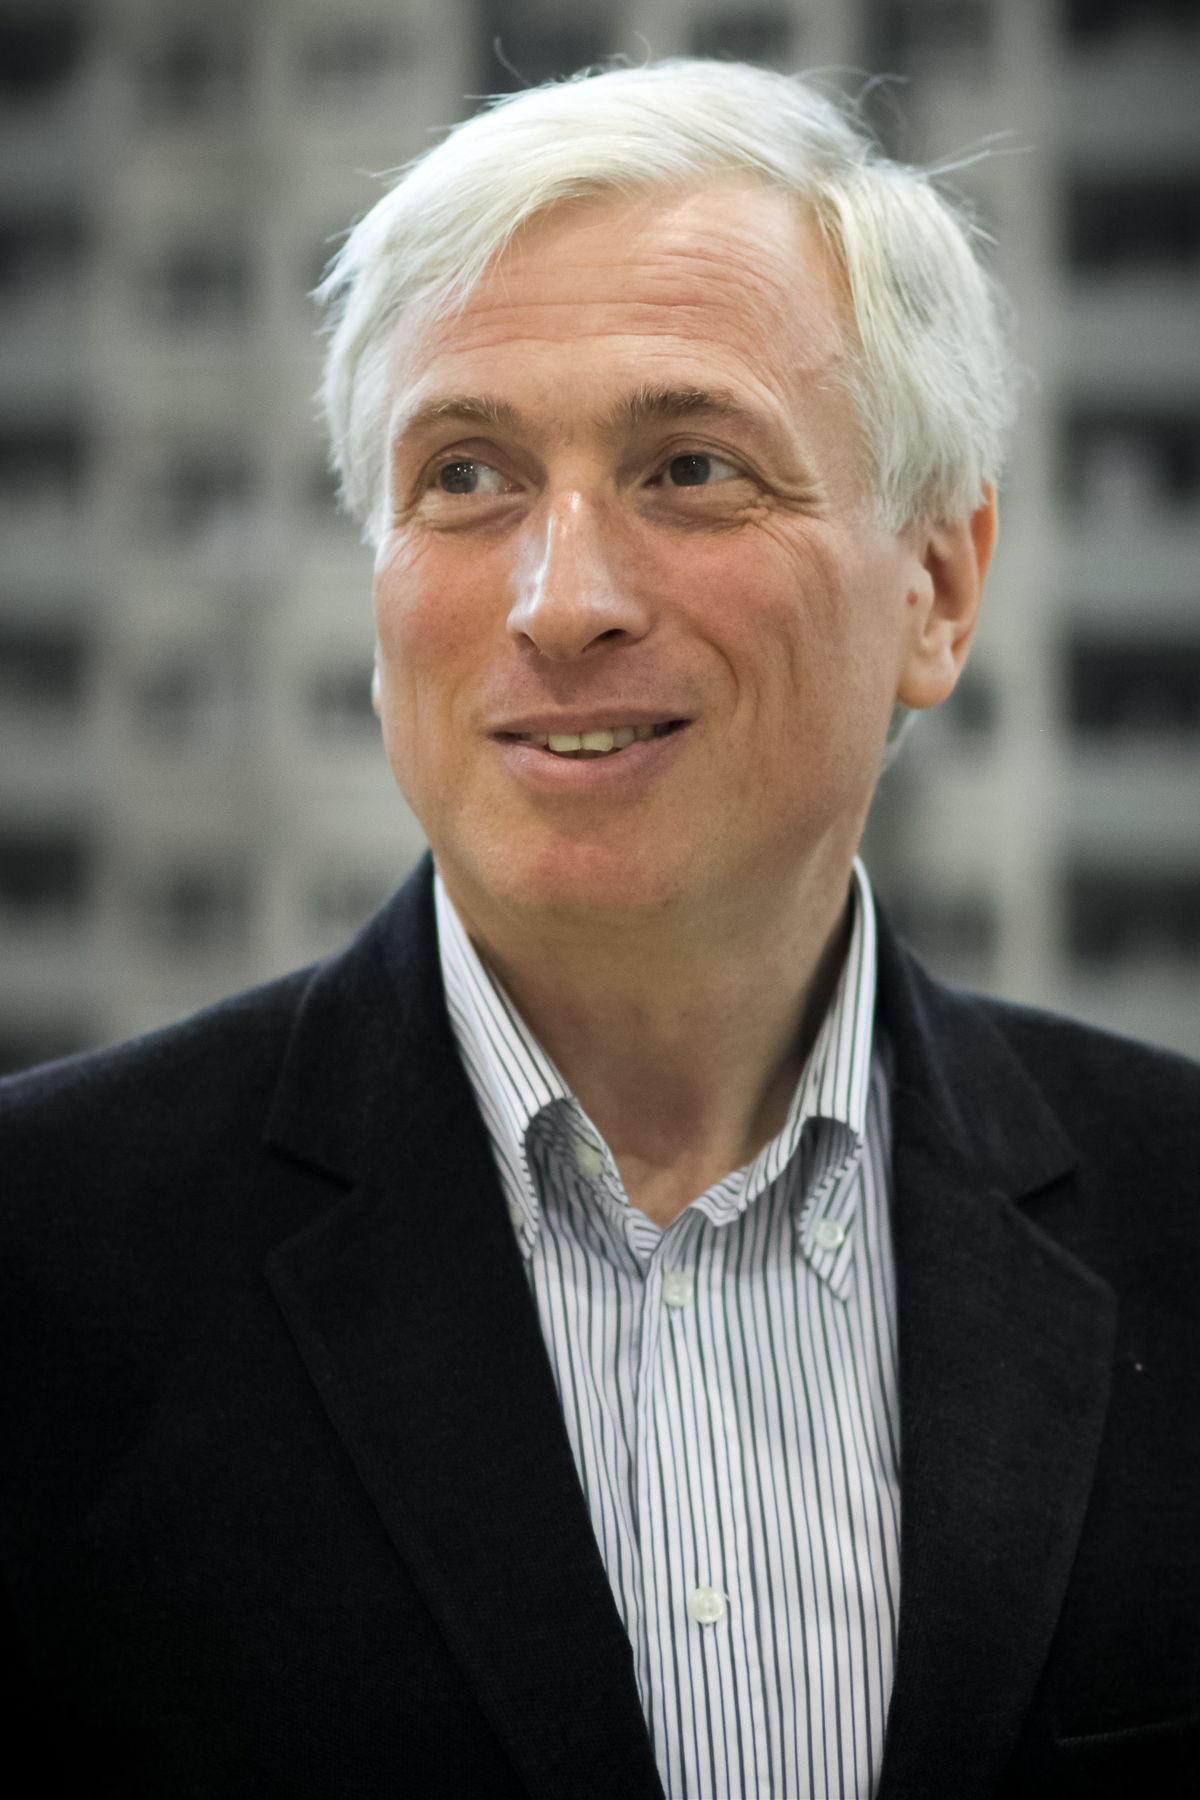 Млечин, Леонид Михайлович — Википедия